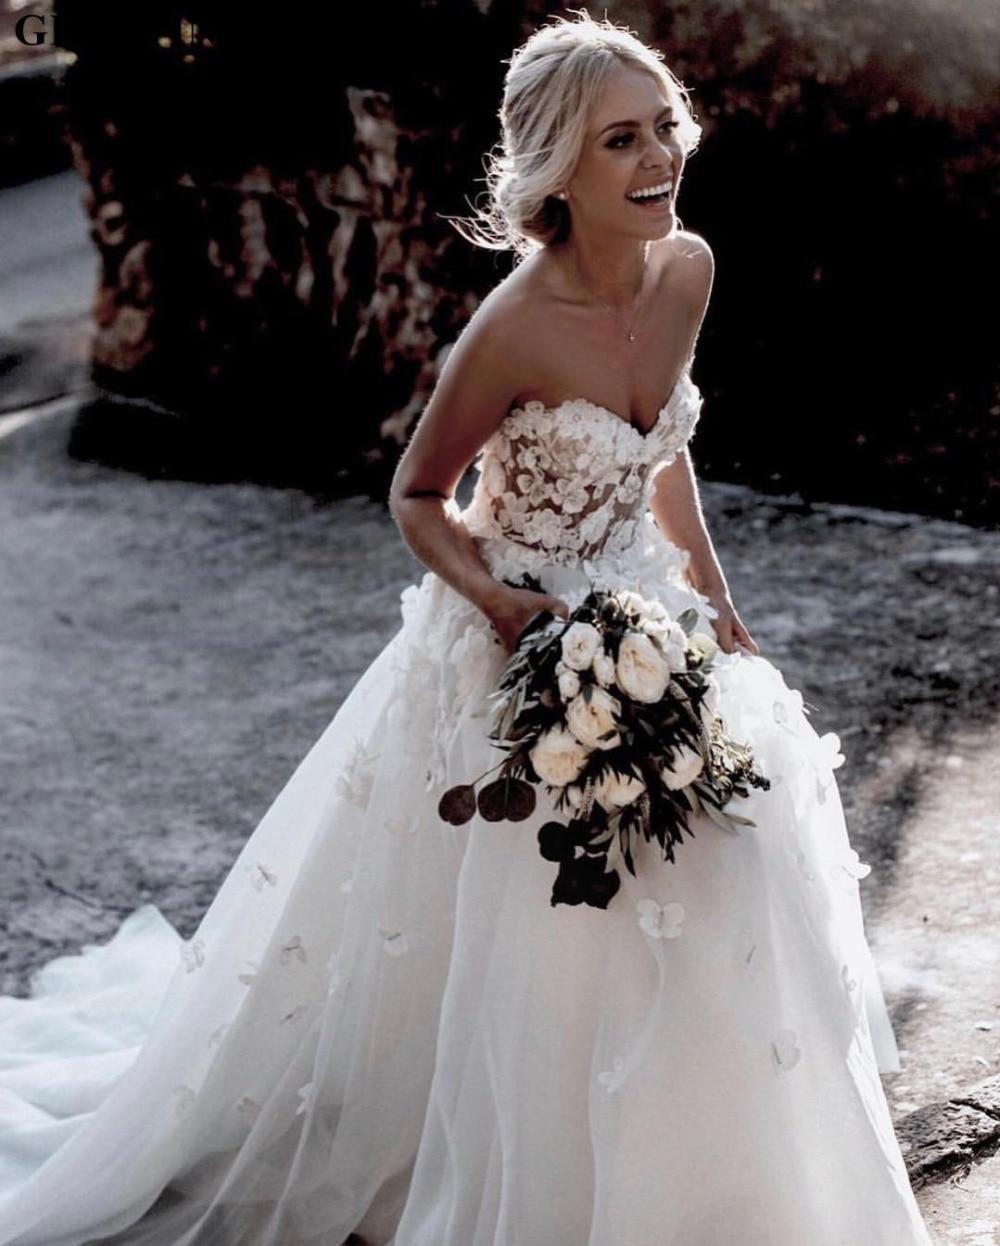 Vintage Lace 3D Flowers Boho Wedding Dress 2019 Elegant Off Shoulder Illusion Summer Beach Wedding Dresses Country Bridal Gowns